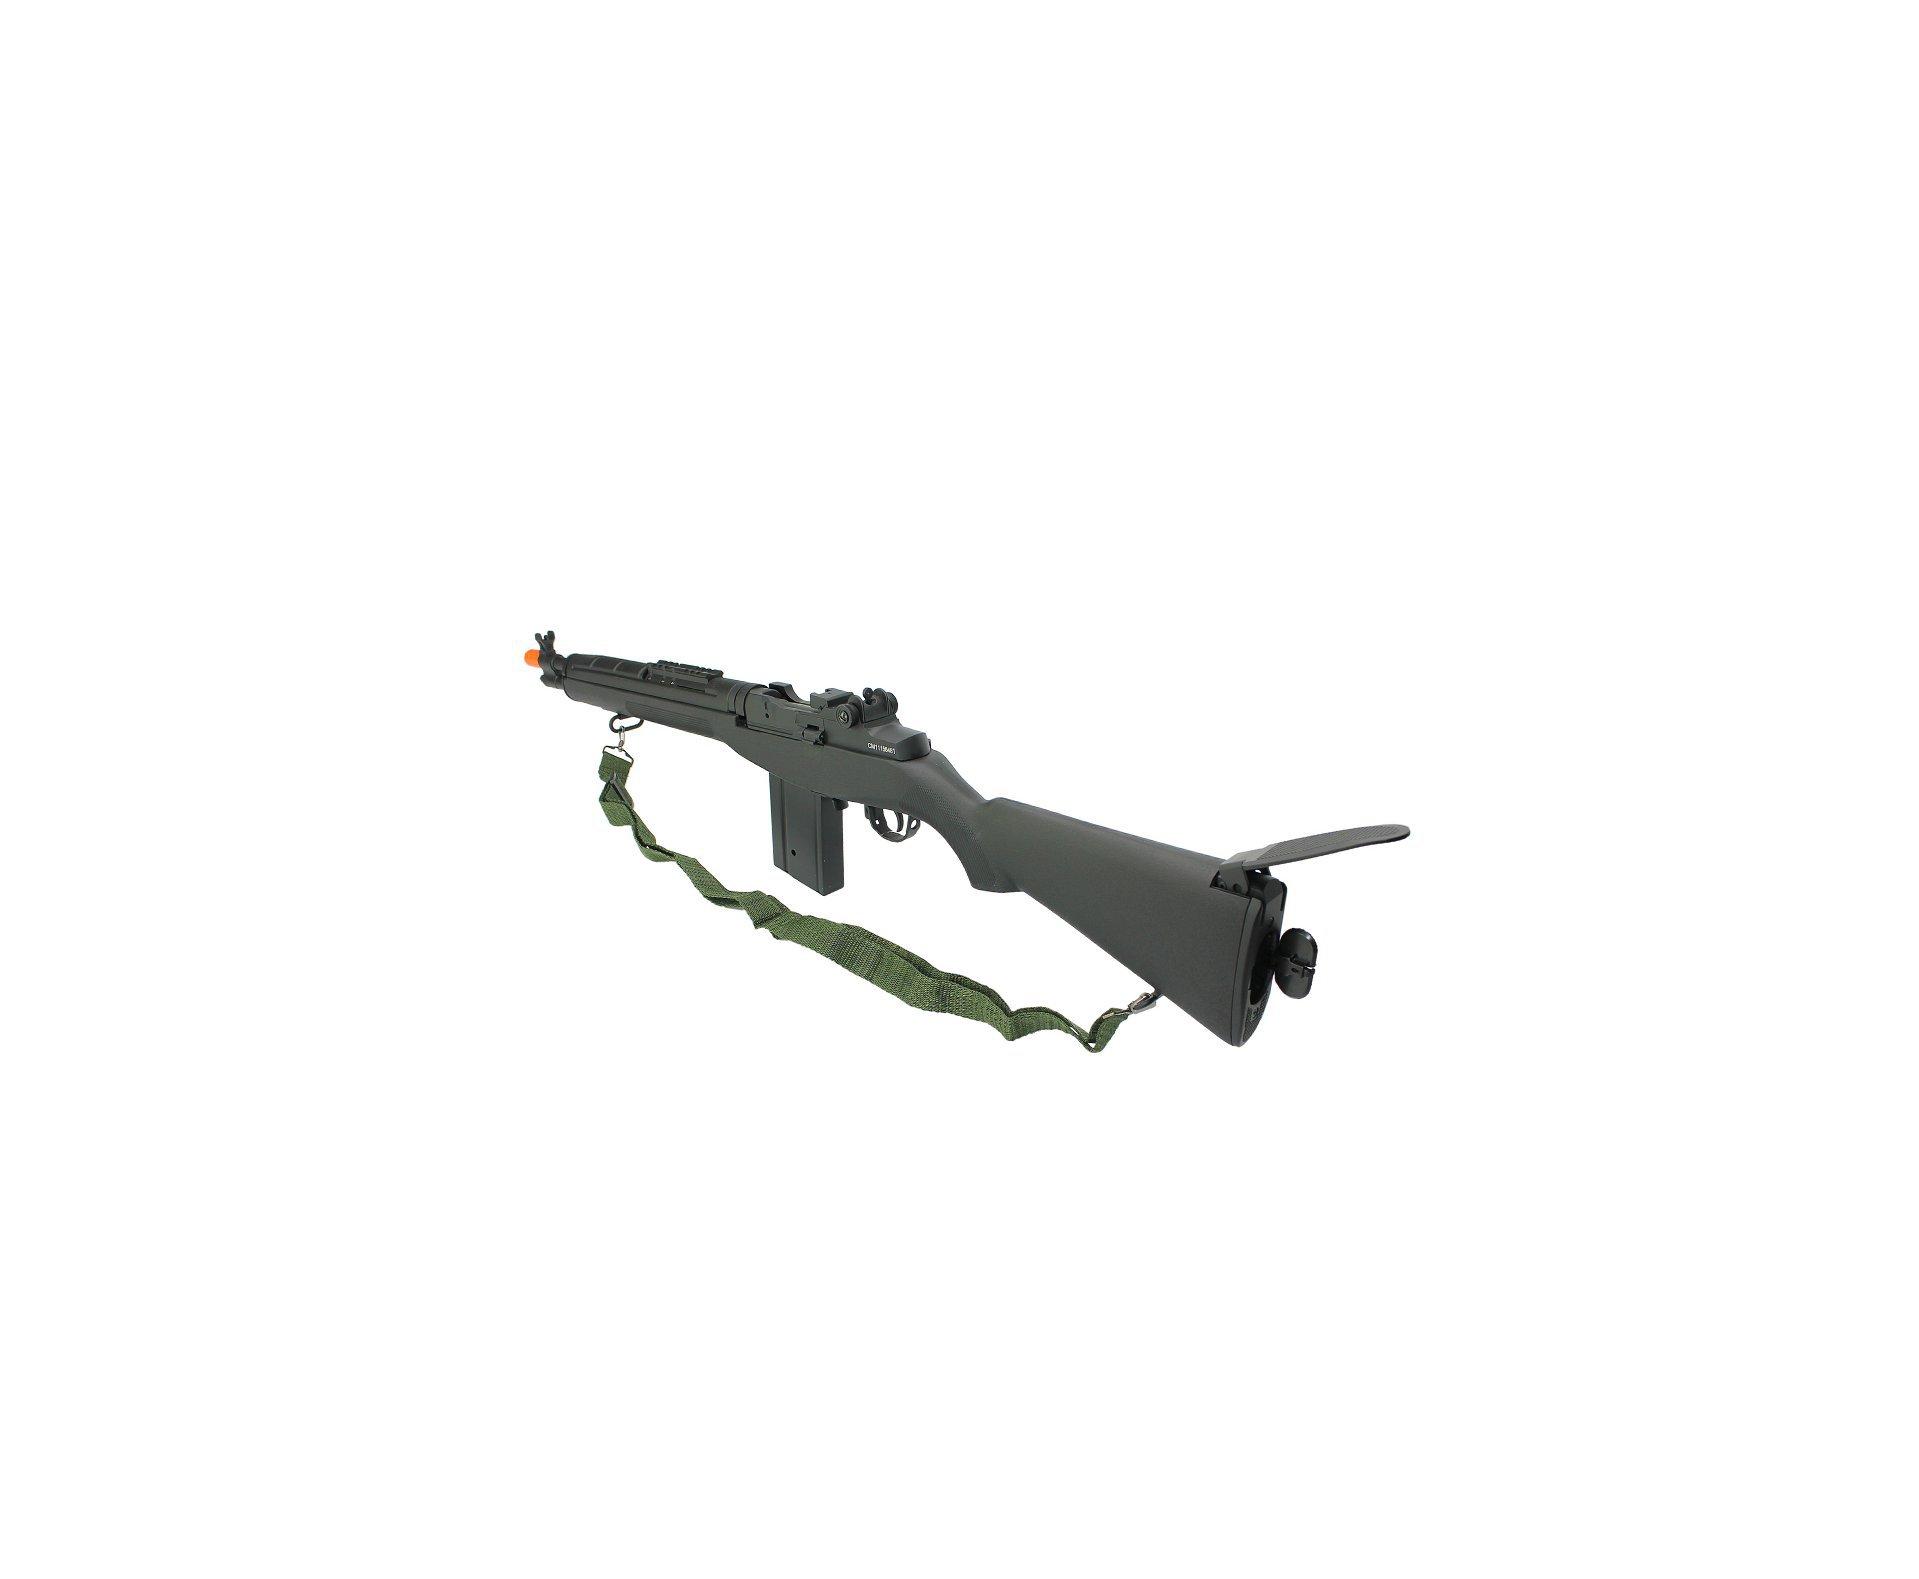 Rifle De Airsoft M14 Scout Socom Aeg Full Metal Cal. 6mm Cm32a Bk - Cyma